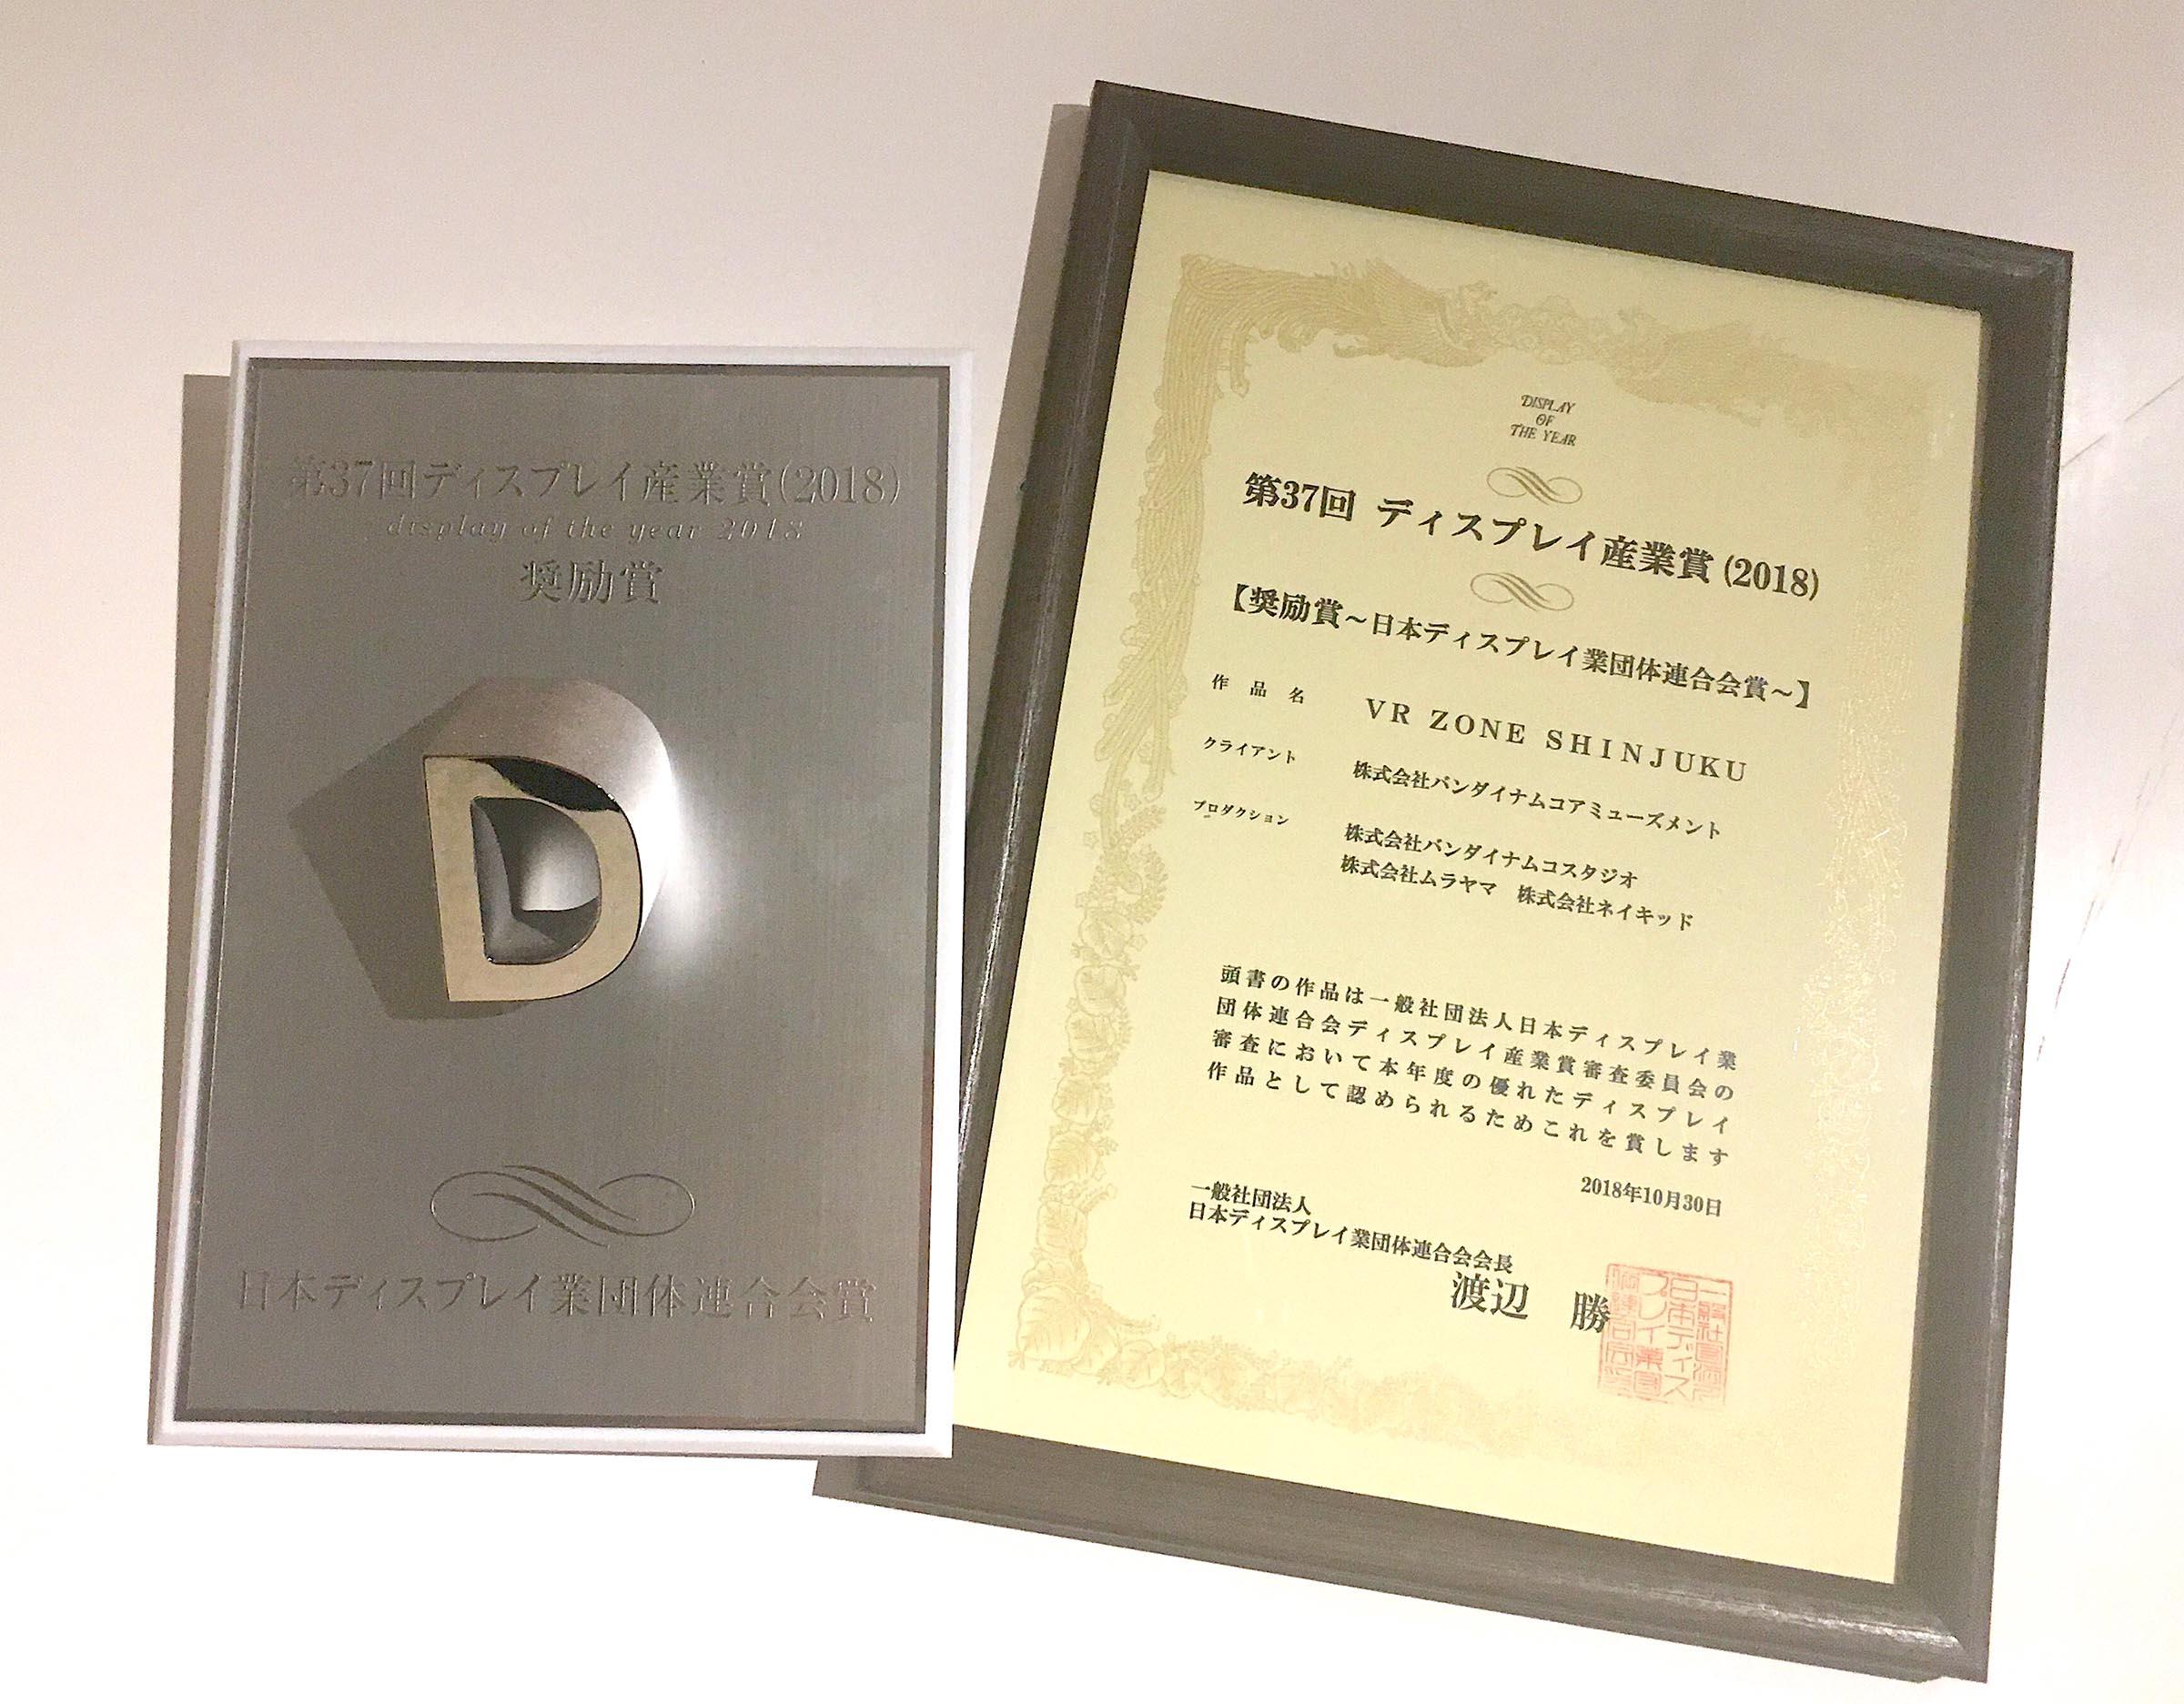 「VR ZONE SHINJUKU」のプロダクションとして「第37回ディスプレイ産業賞(2018)」奨励賞 受賞